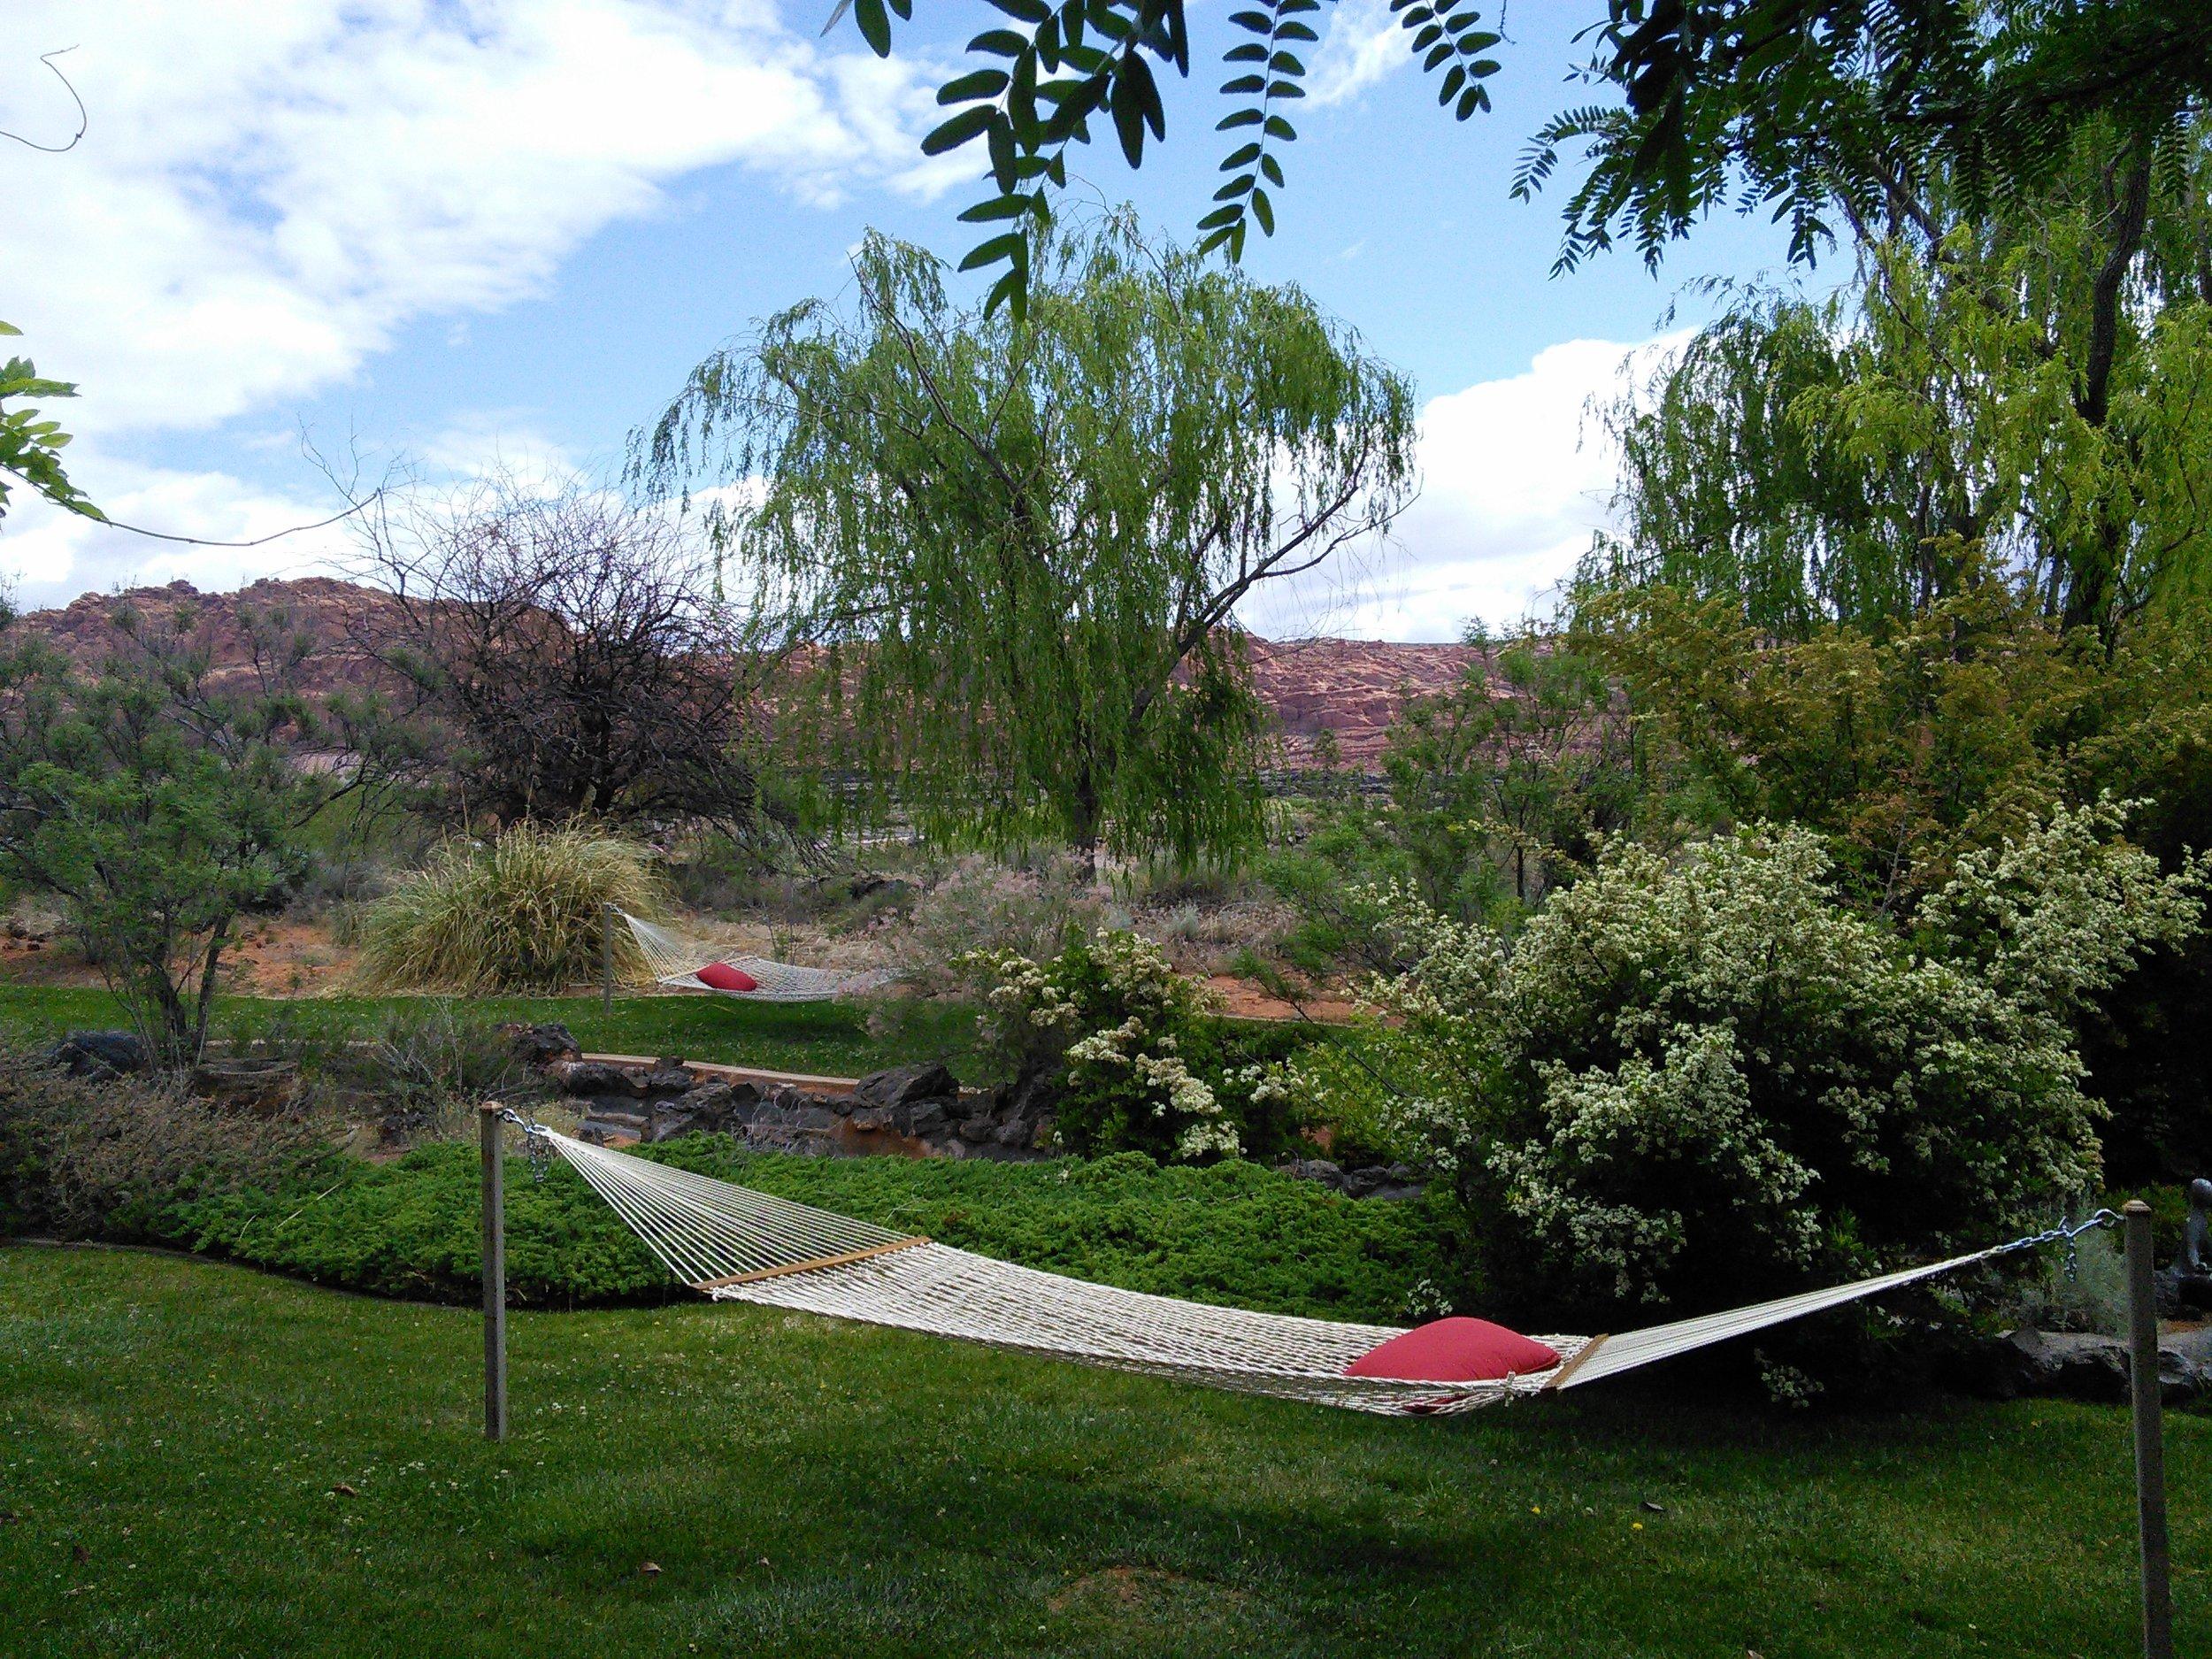 wellness vacation, jeri Donovan, well traveled, red mountain resort